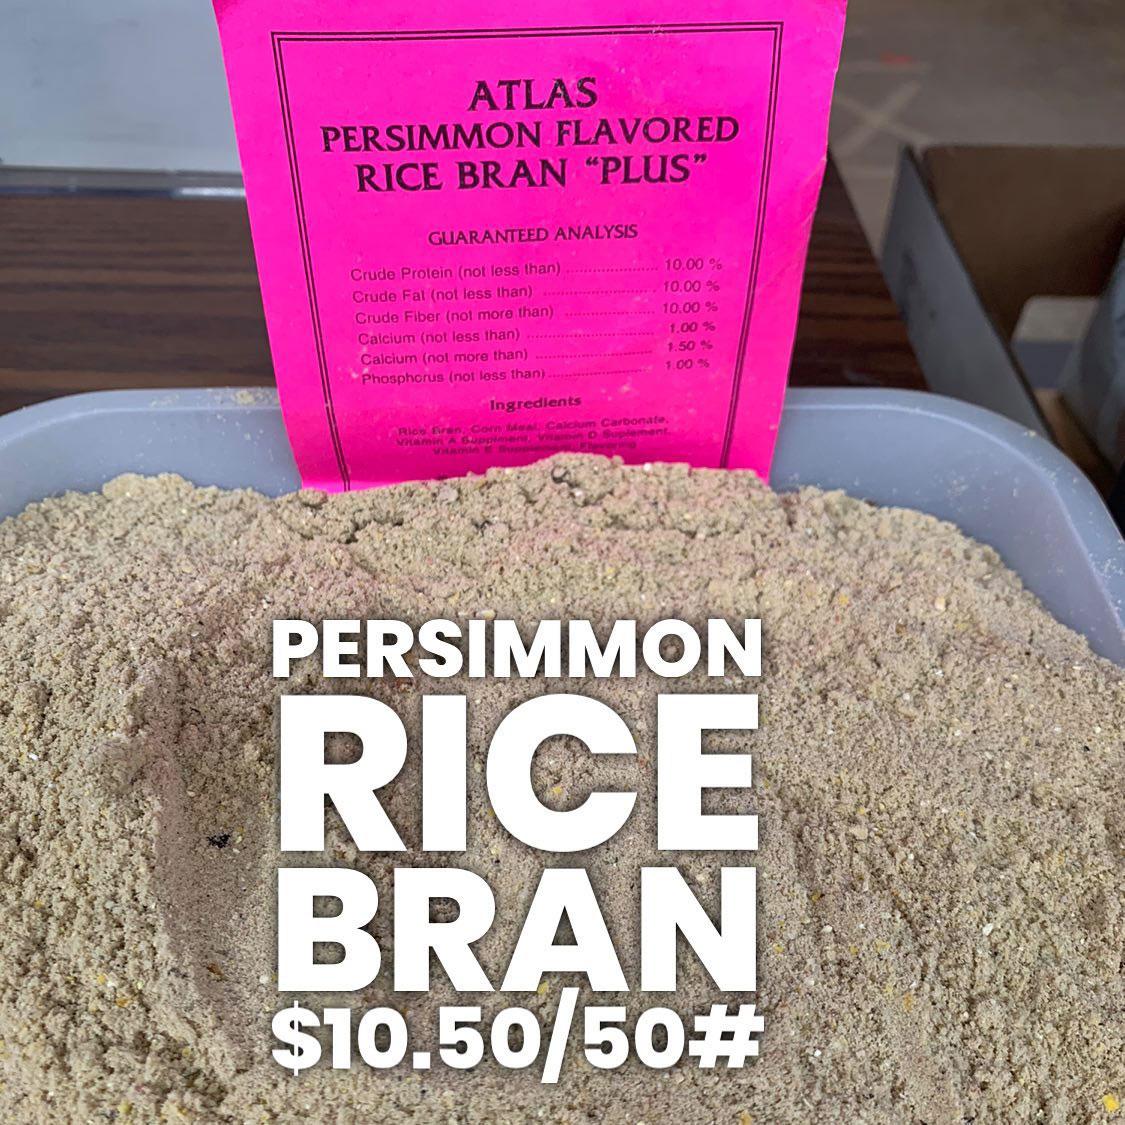 Persimmon-Rice-Bran-